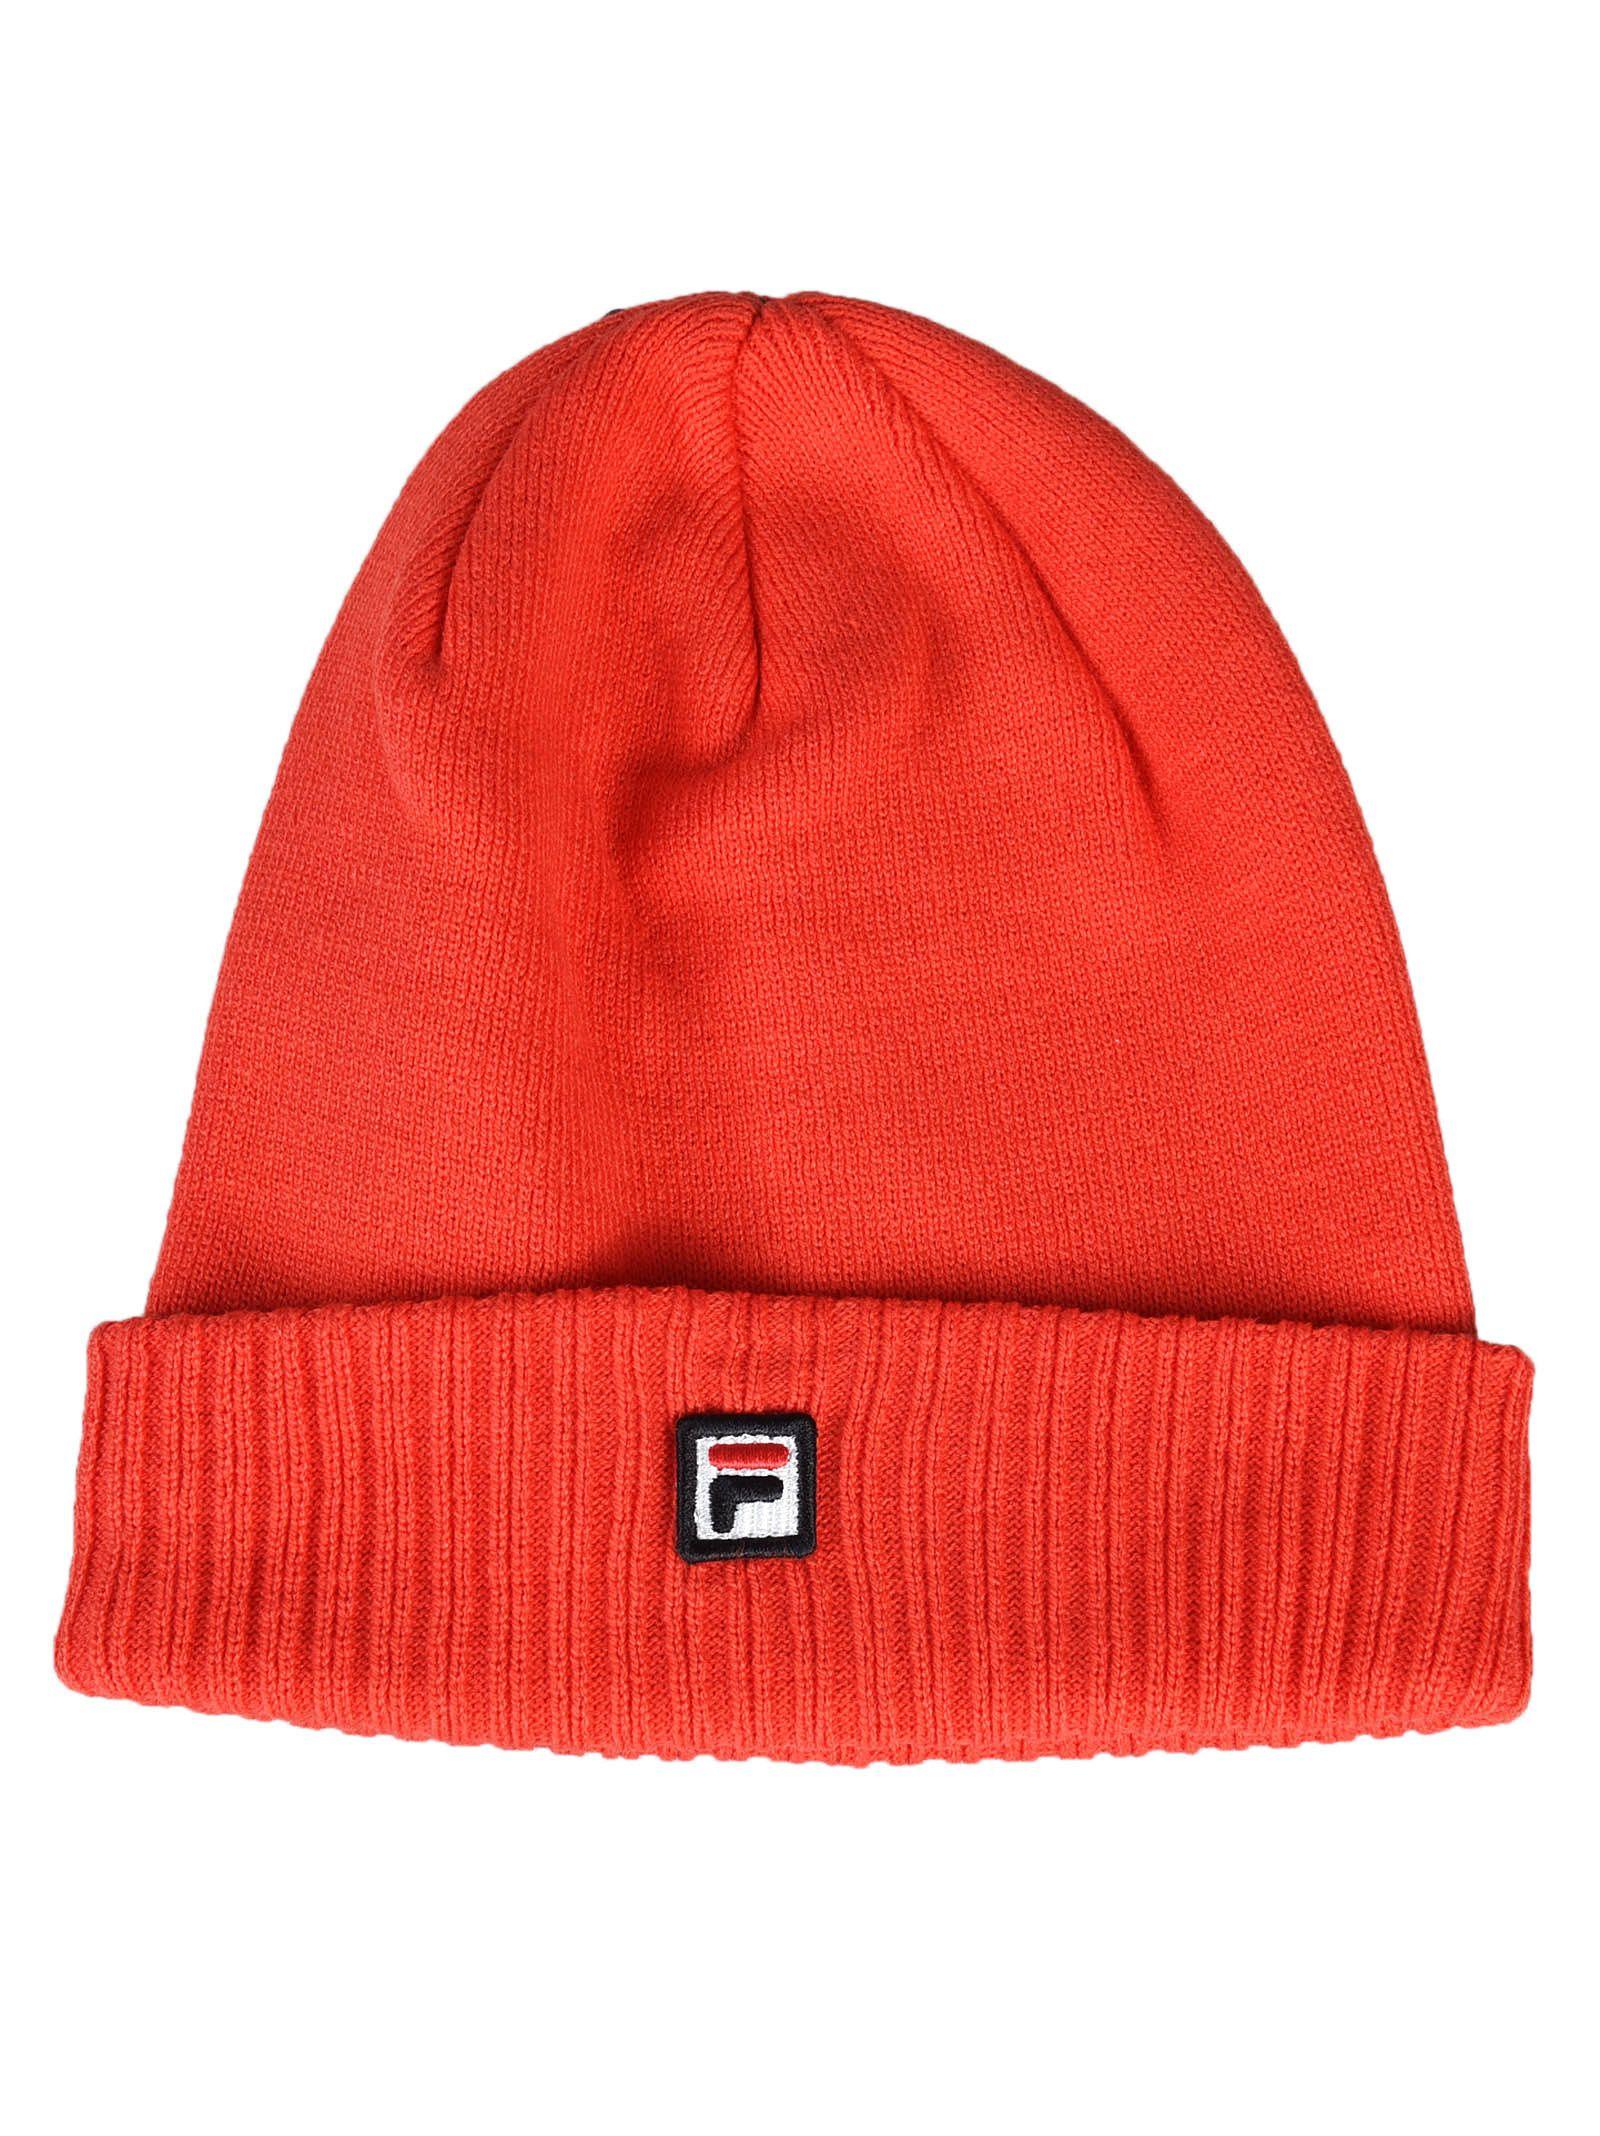 877008fa163 Fila Fila Logo Knit Beanie - Red - 8922145